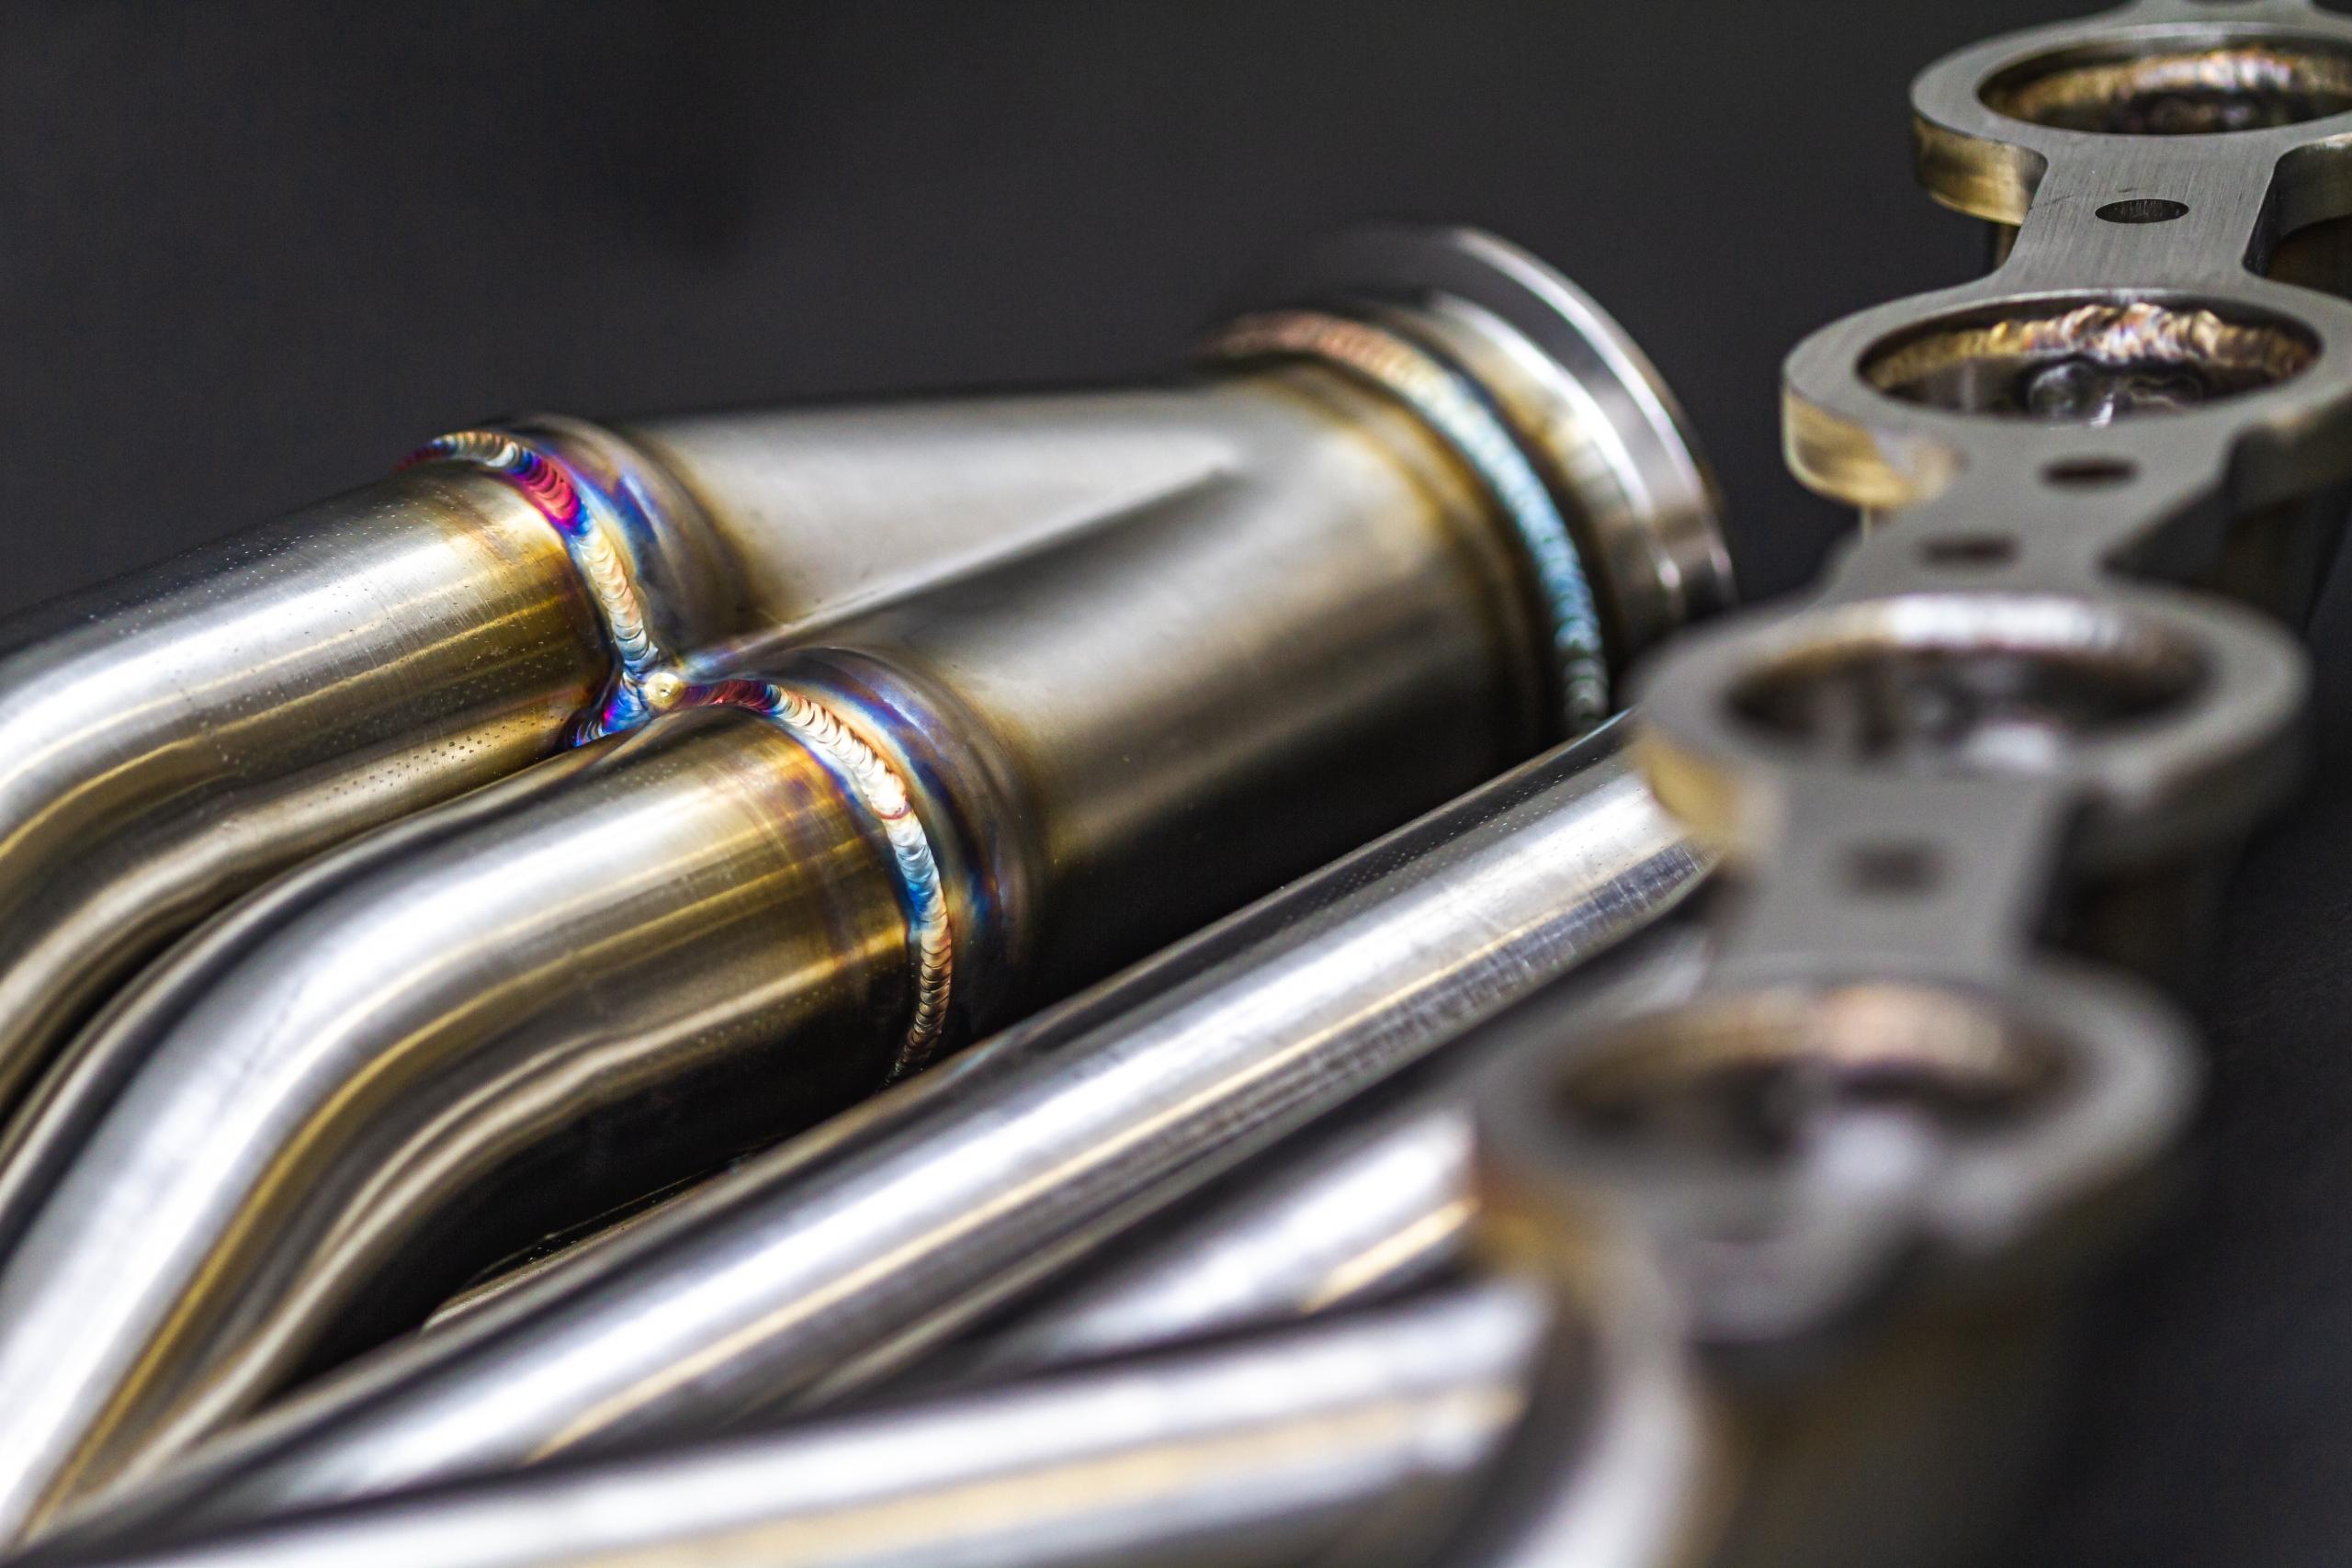 Sikky Infiniti G37 LS Swap Headers - Stainless Steel Pro Series